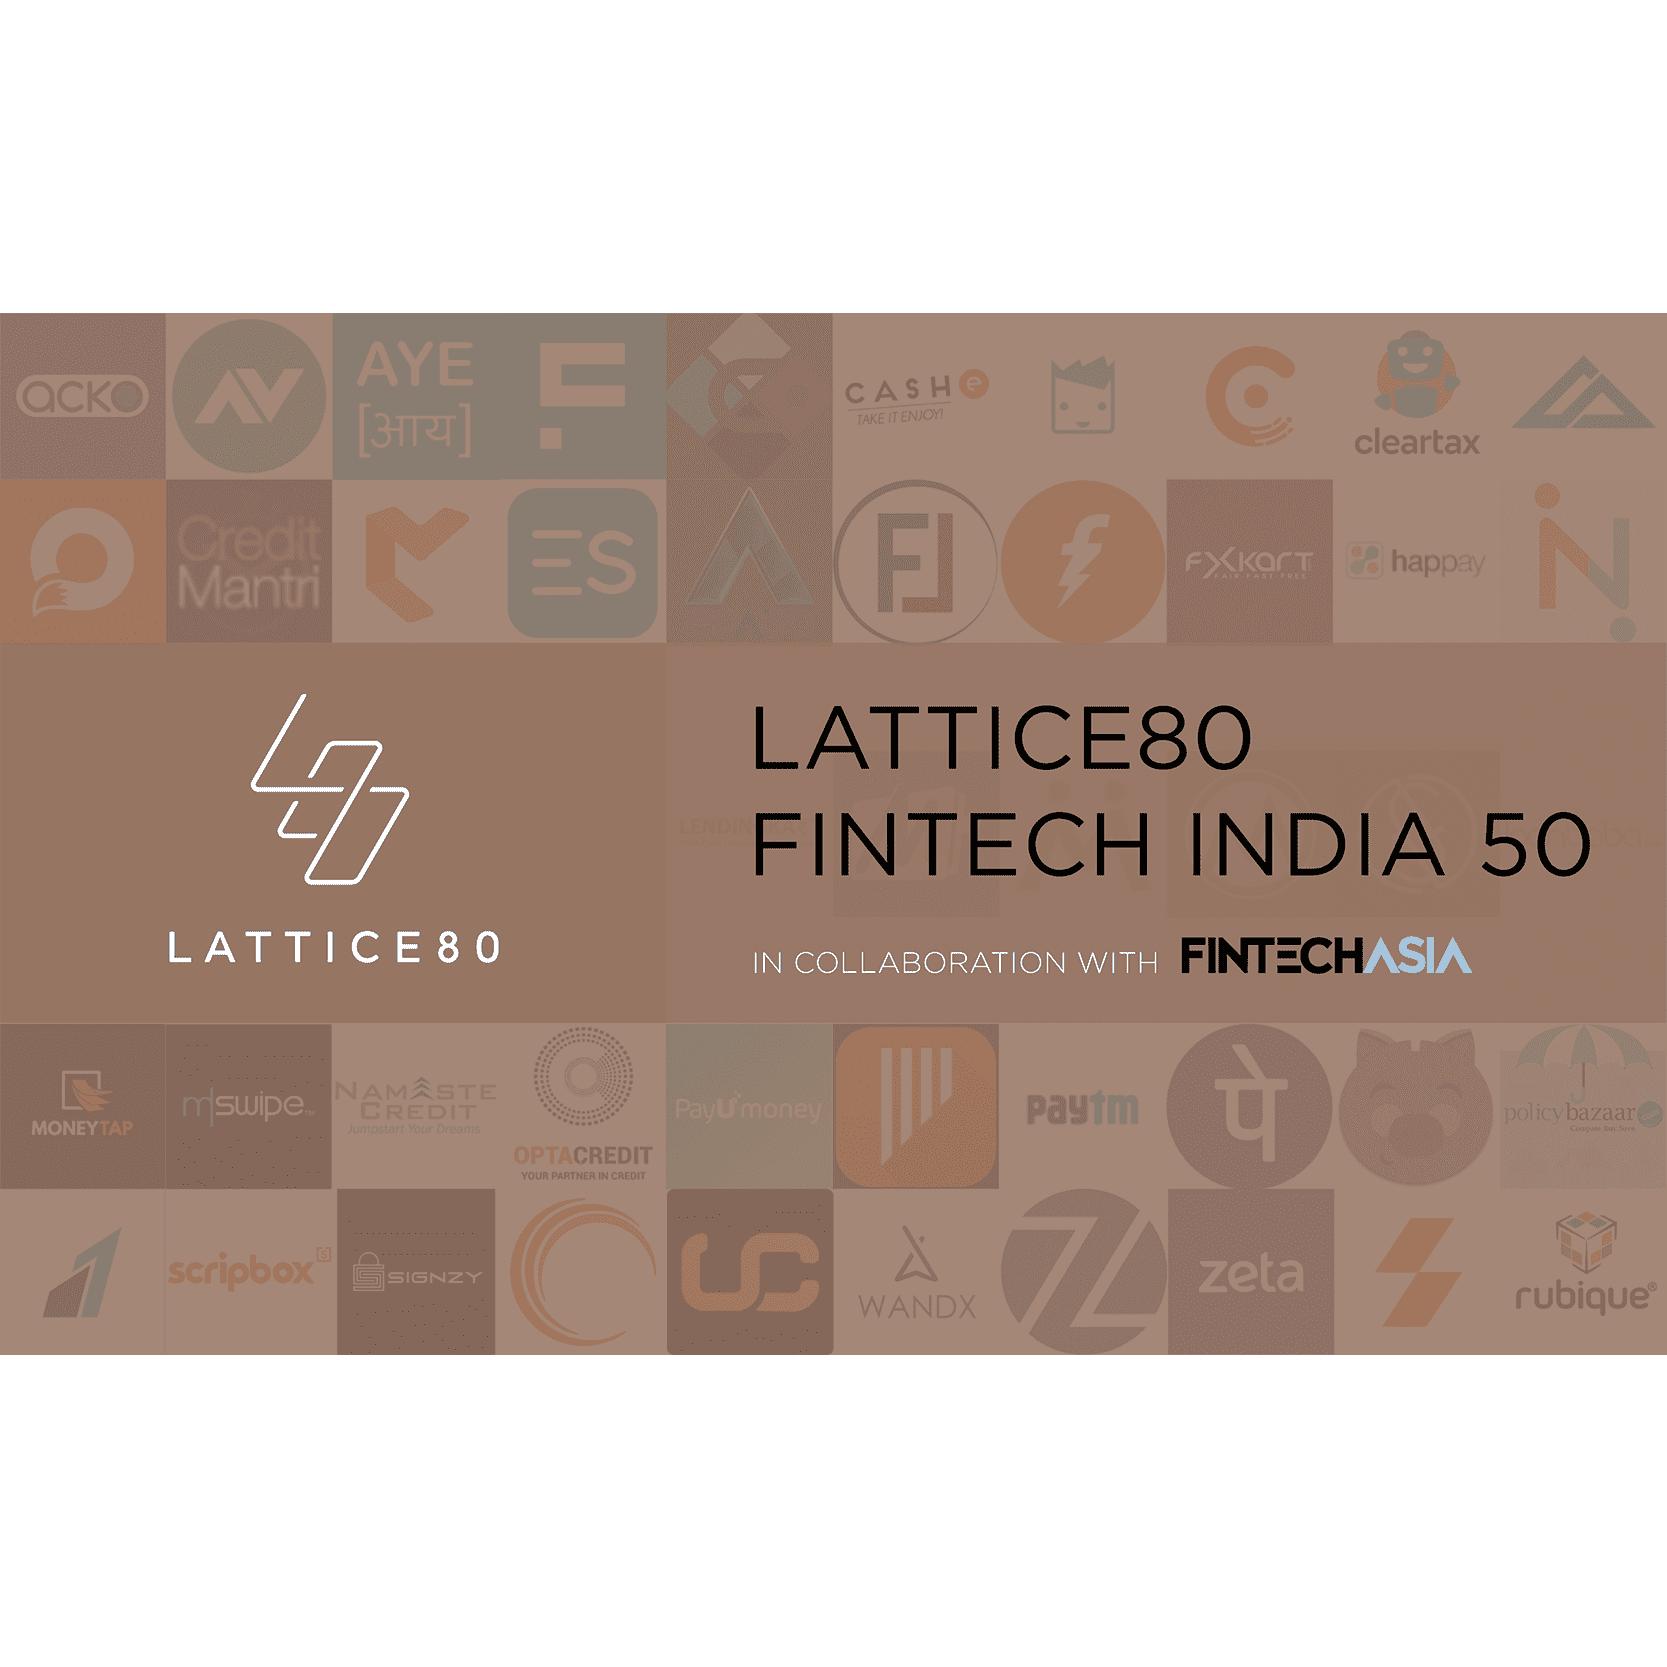 top fintech companies india satyarth mishra lattice80 2018